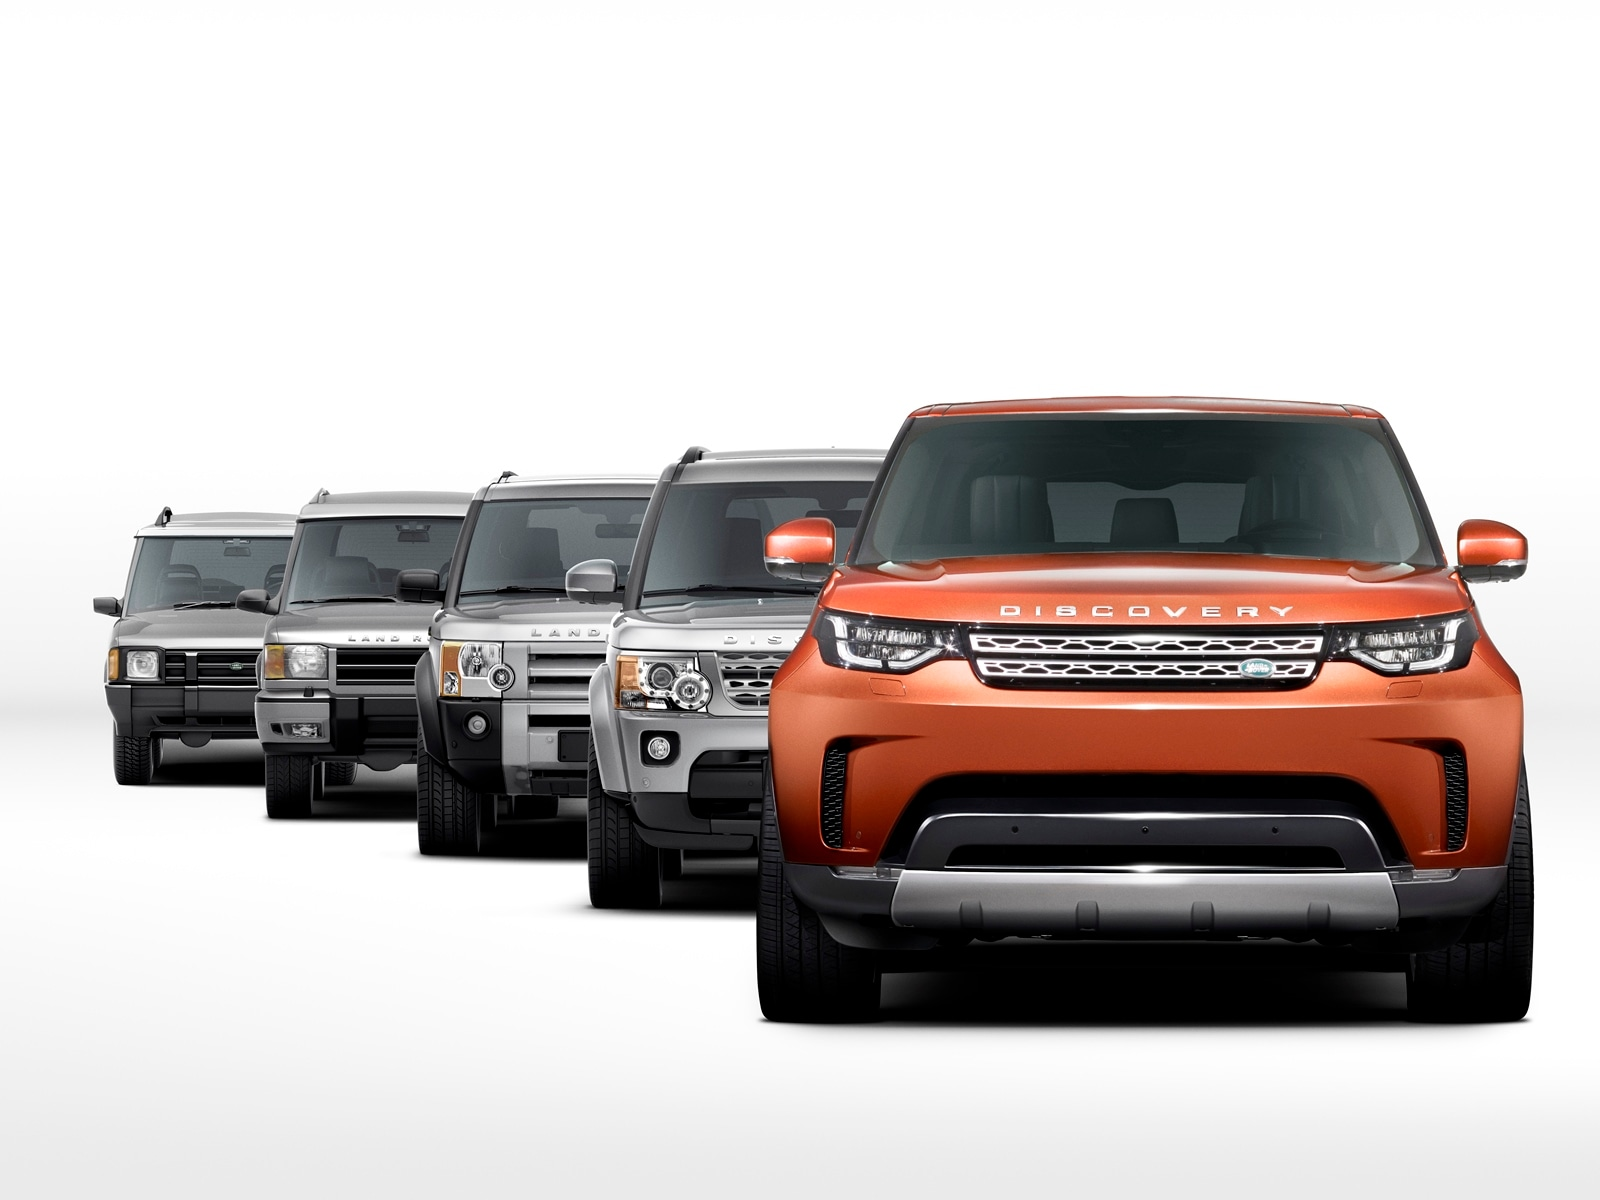 Nuova Land Rover Discovery, le foto in anteprima